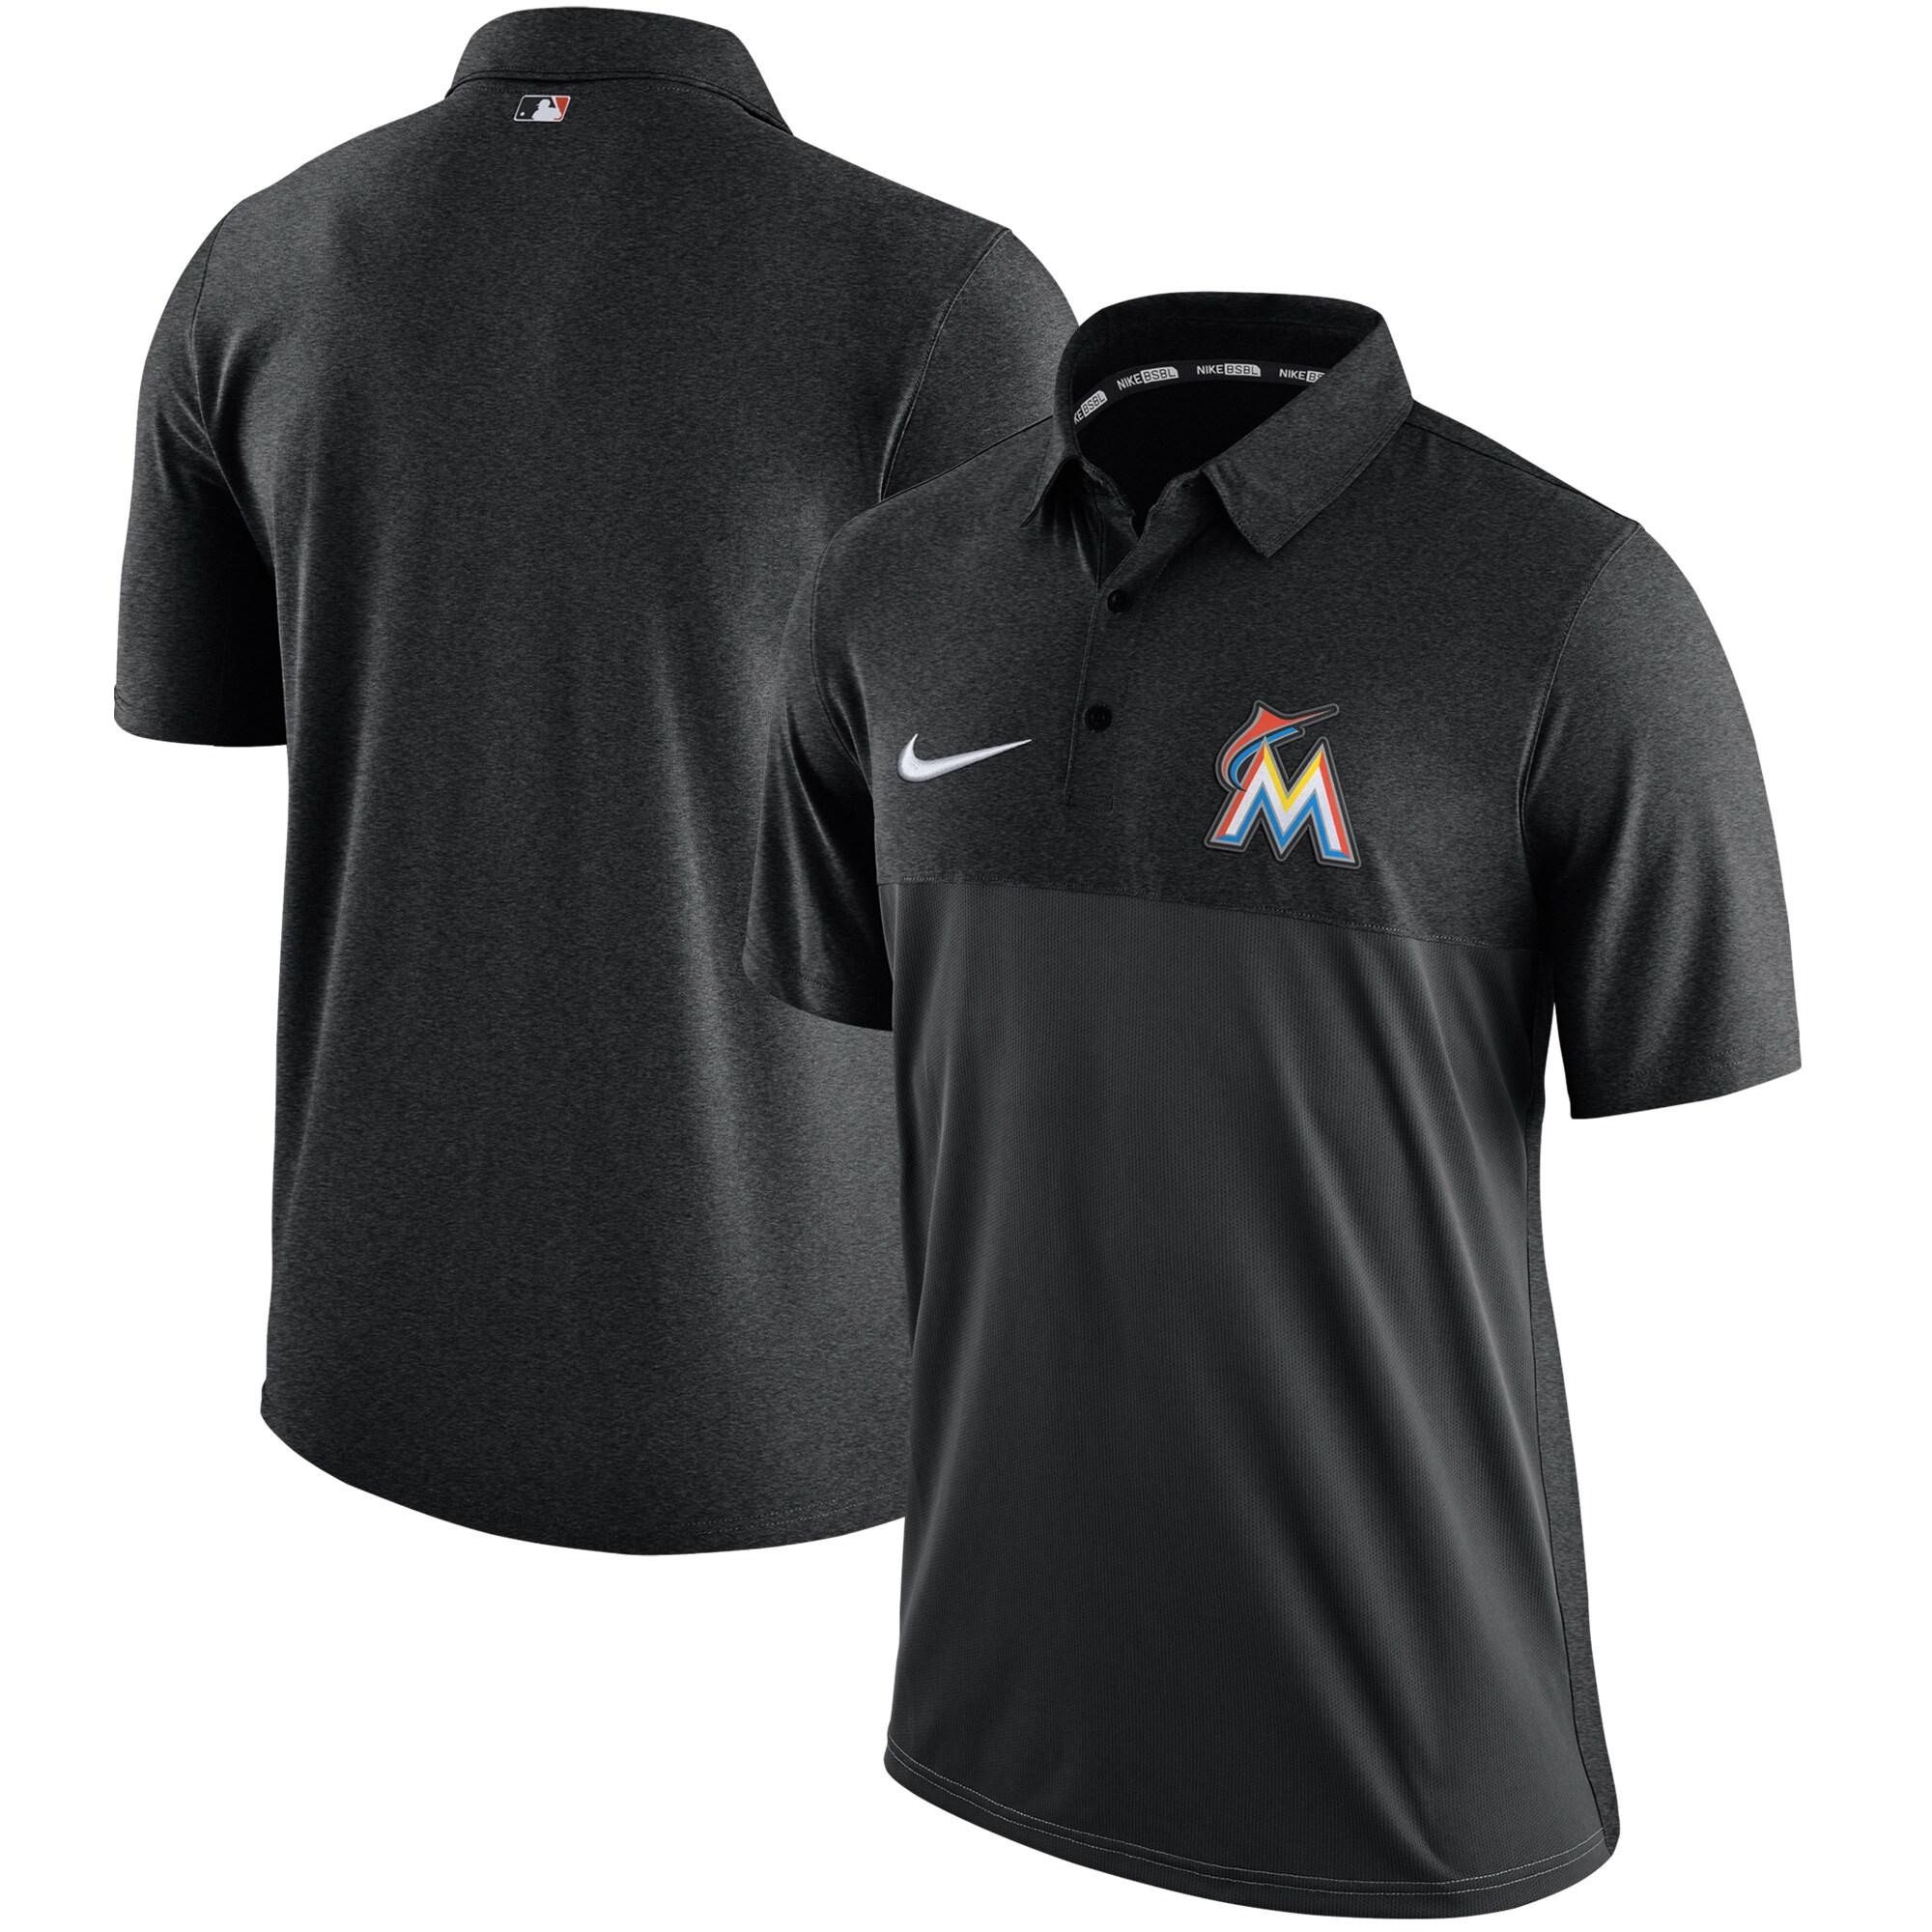 Miami Marlins Nike Authentic Collection Elite Polo - Black